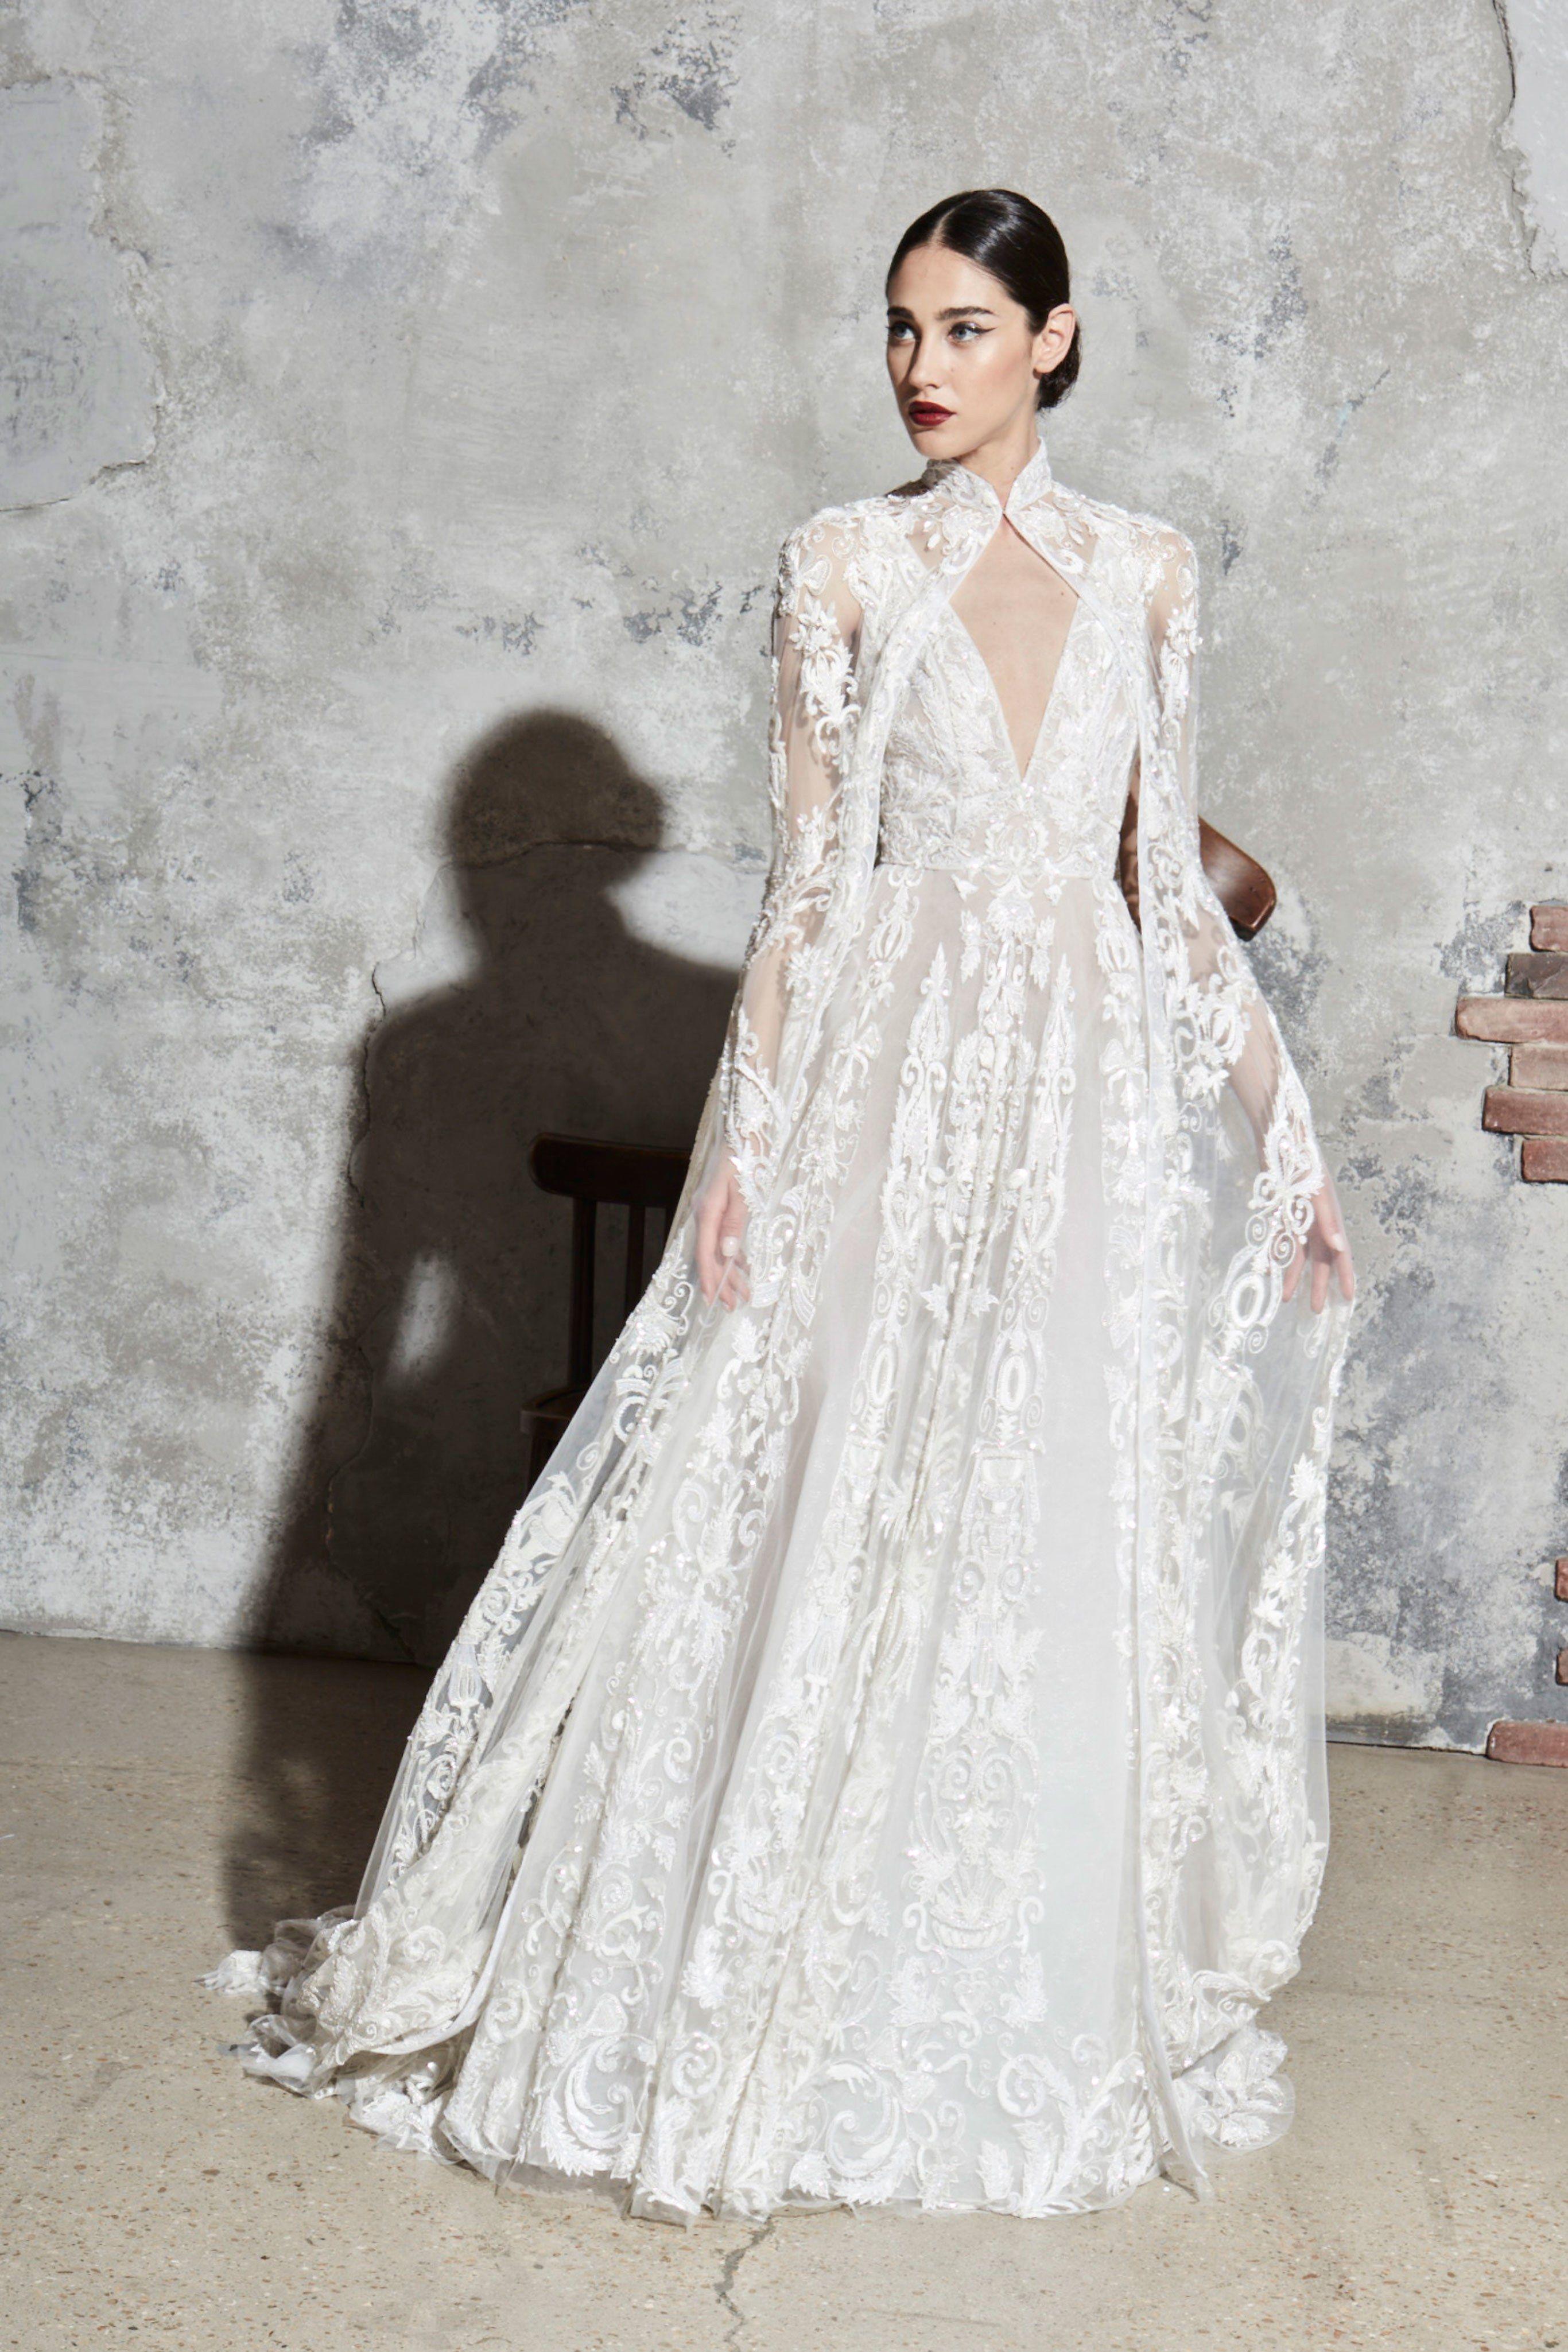 Zuhair Murad Bridal Spring 2020 Fashion Show Winter Wedding Dress Zuhair Murad Bridal Bridal Dresses